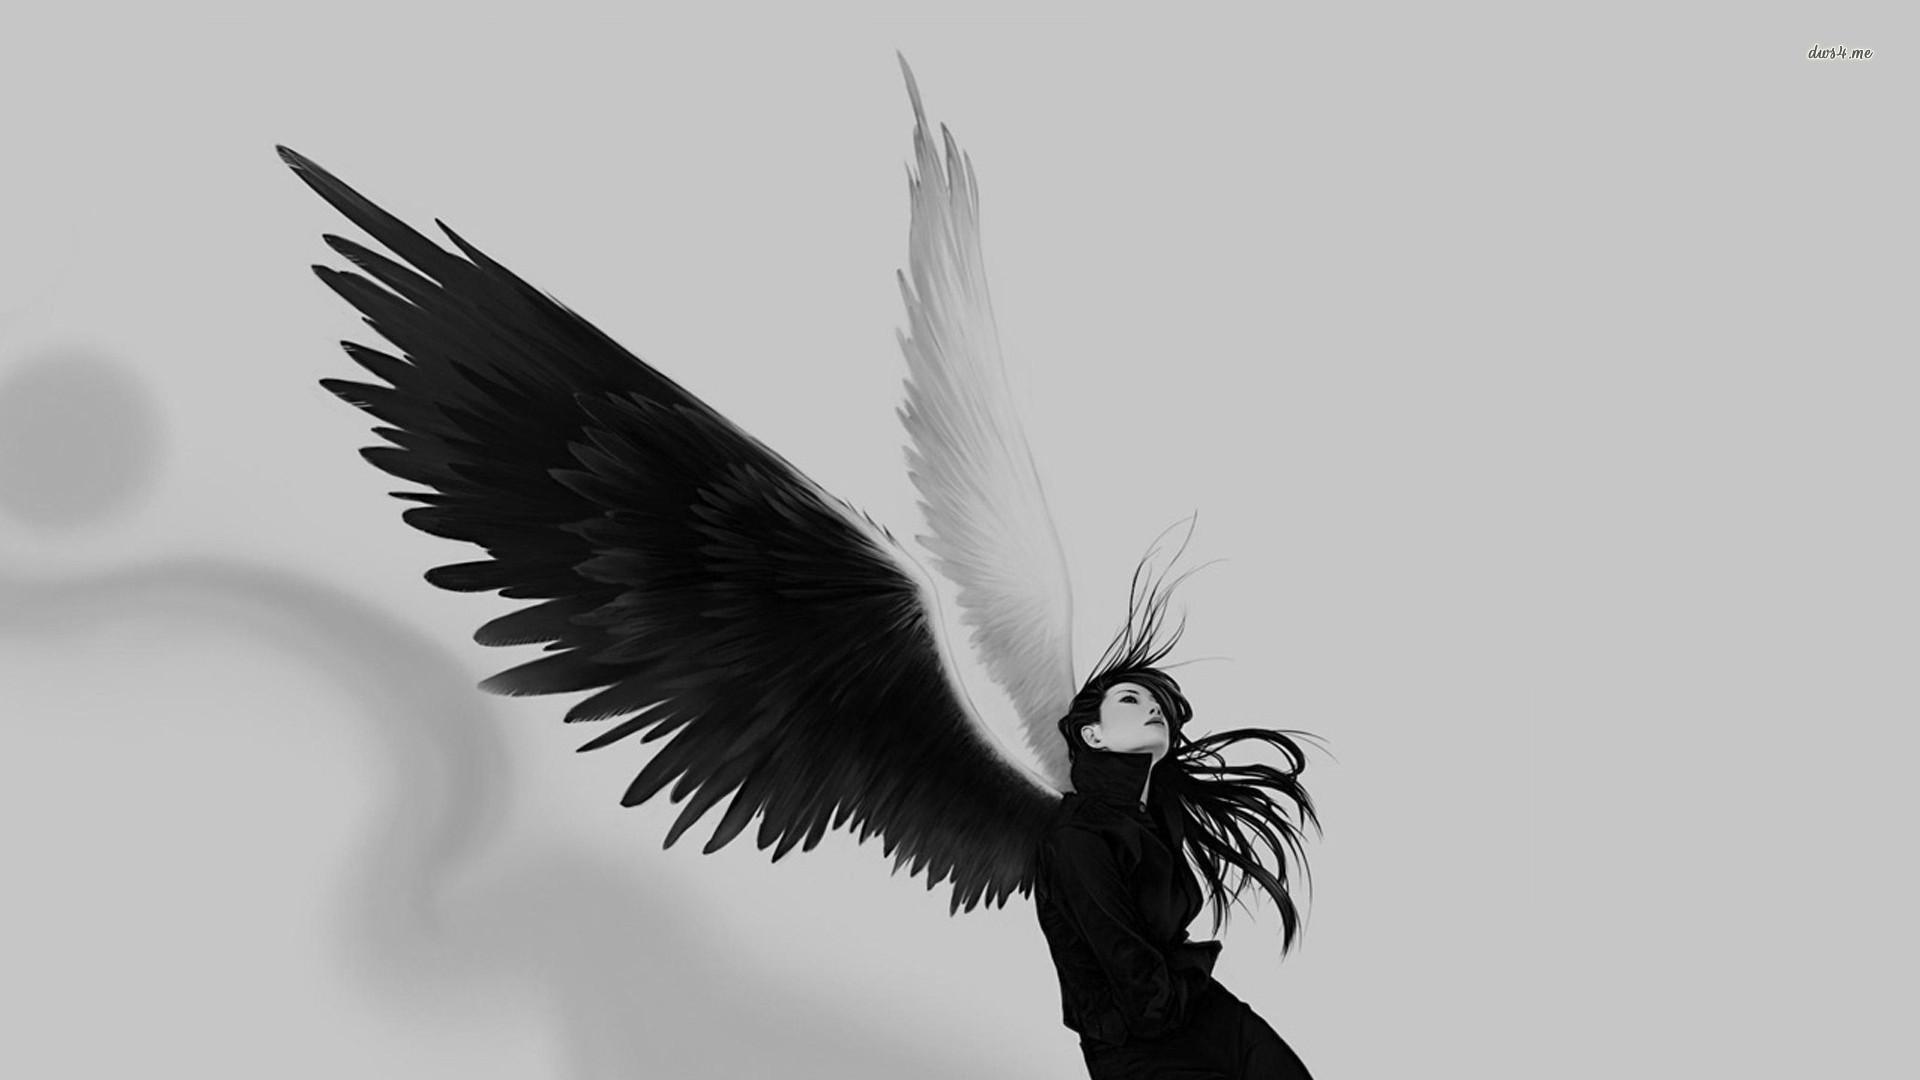 Black angel Artistic HD desktop wallpaper, Wing wallpaper, Woman wallpaper, Angel  wallpaper – Artistic no.